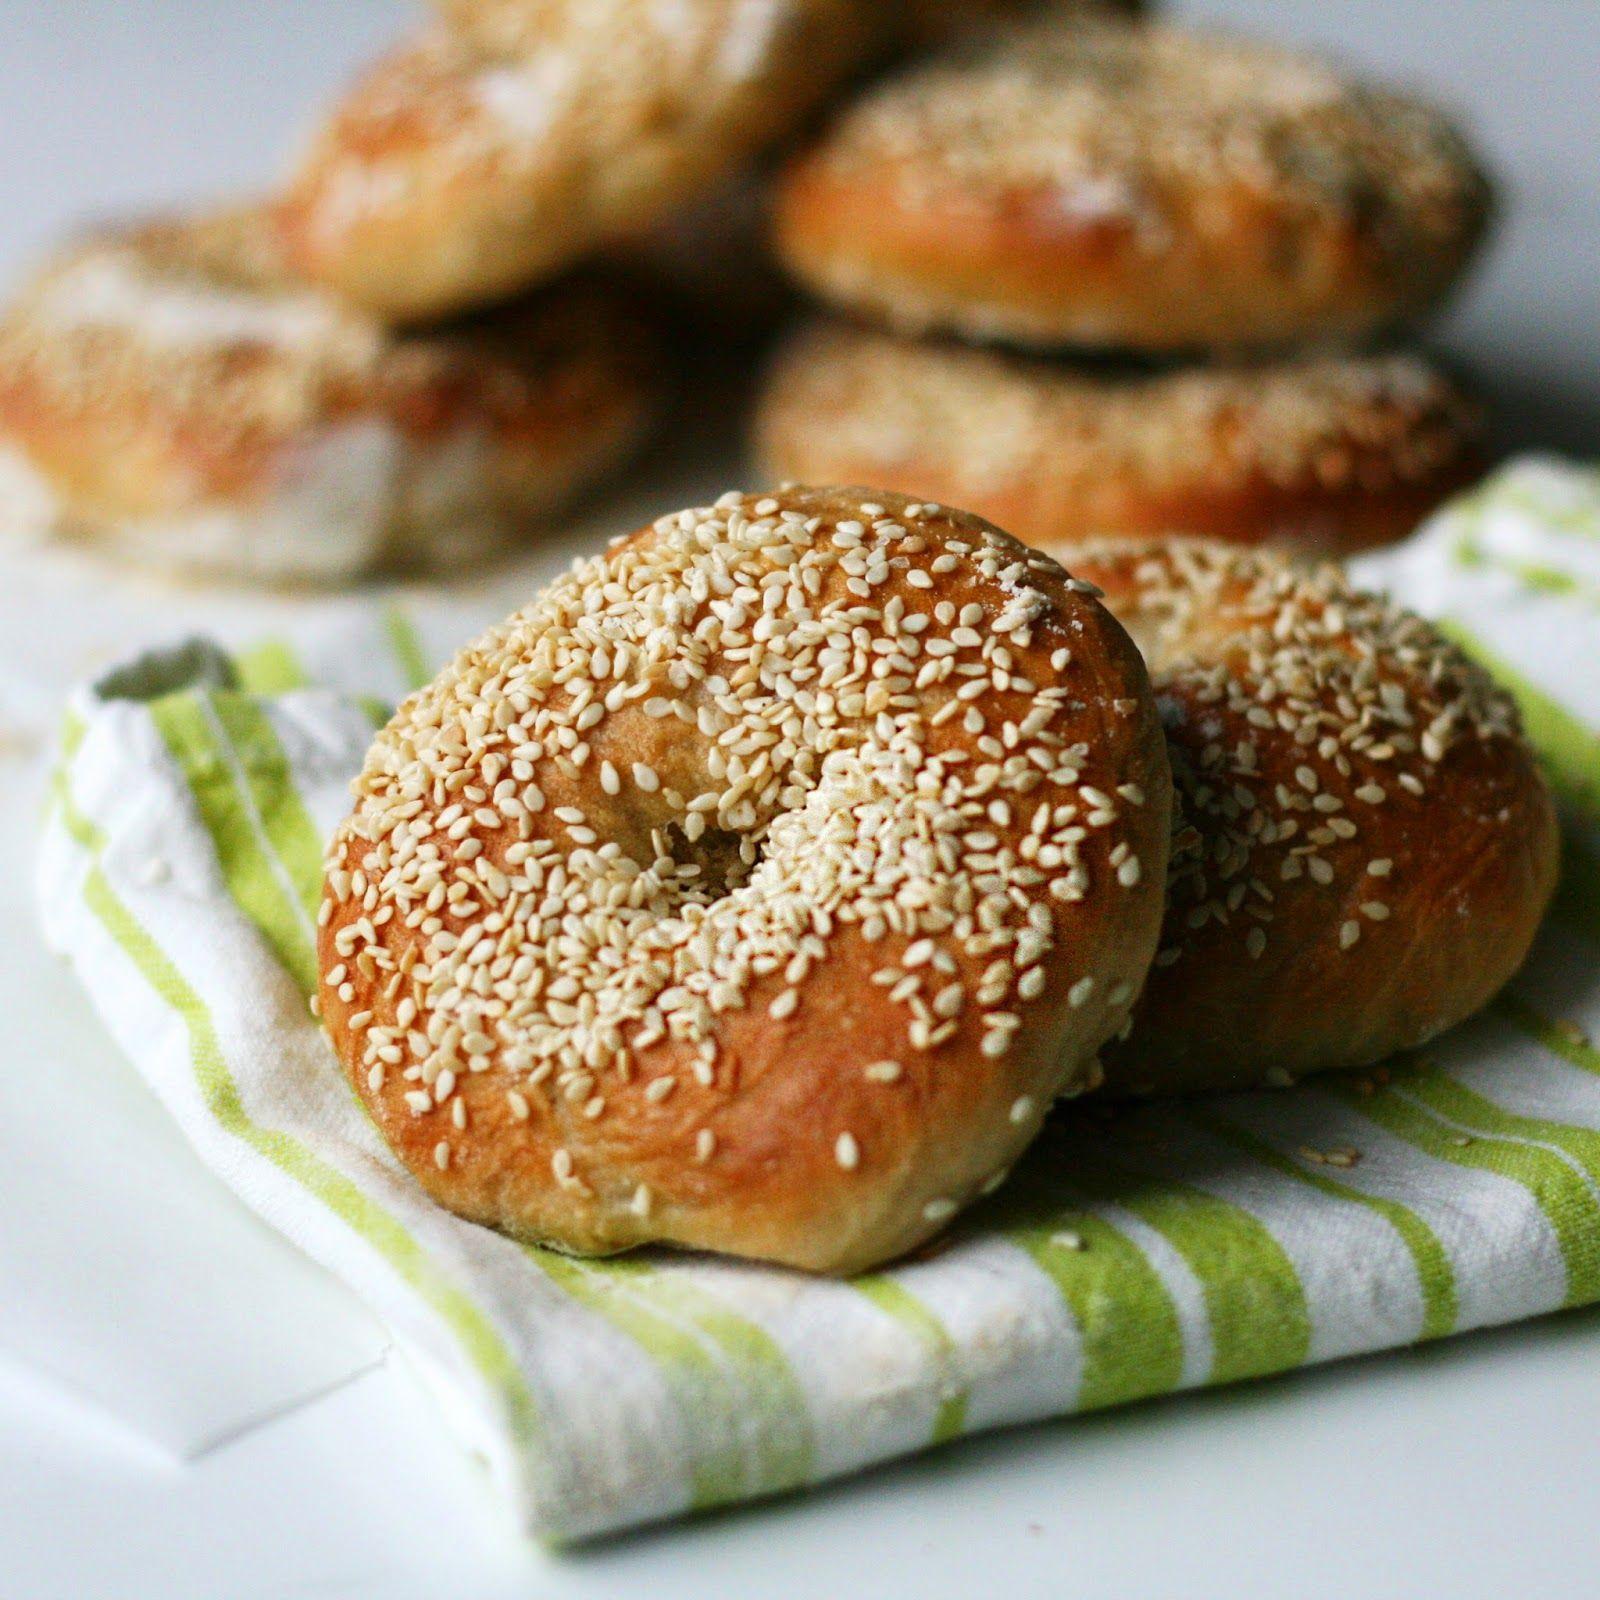 Homemade sesame seed bagels. Vegan - by Maikin mokomin